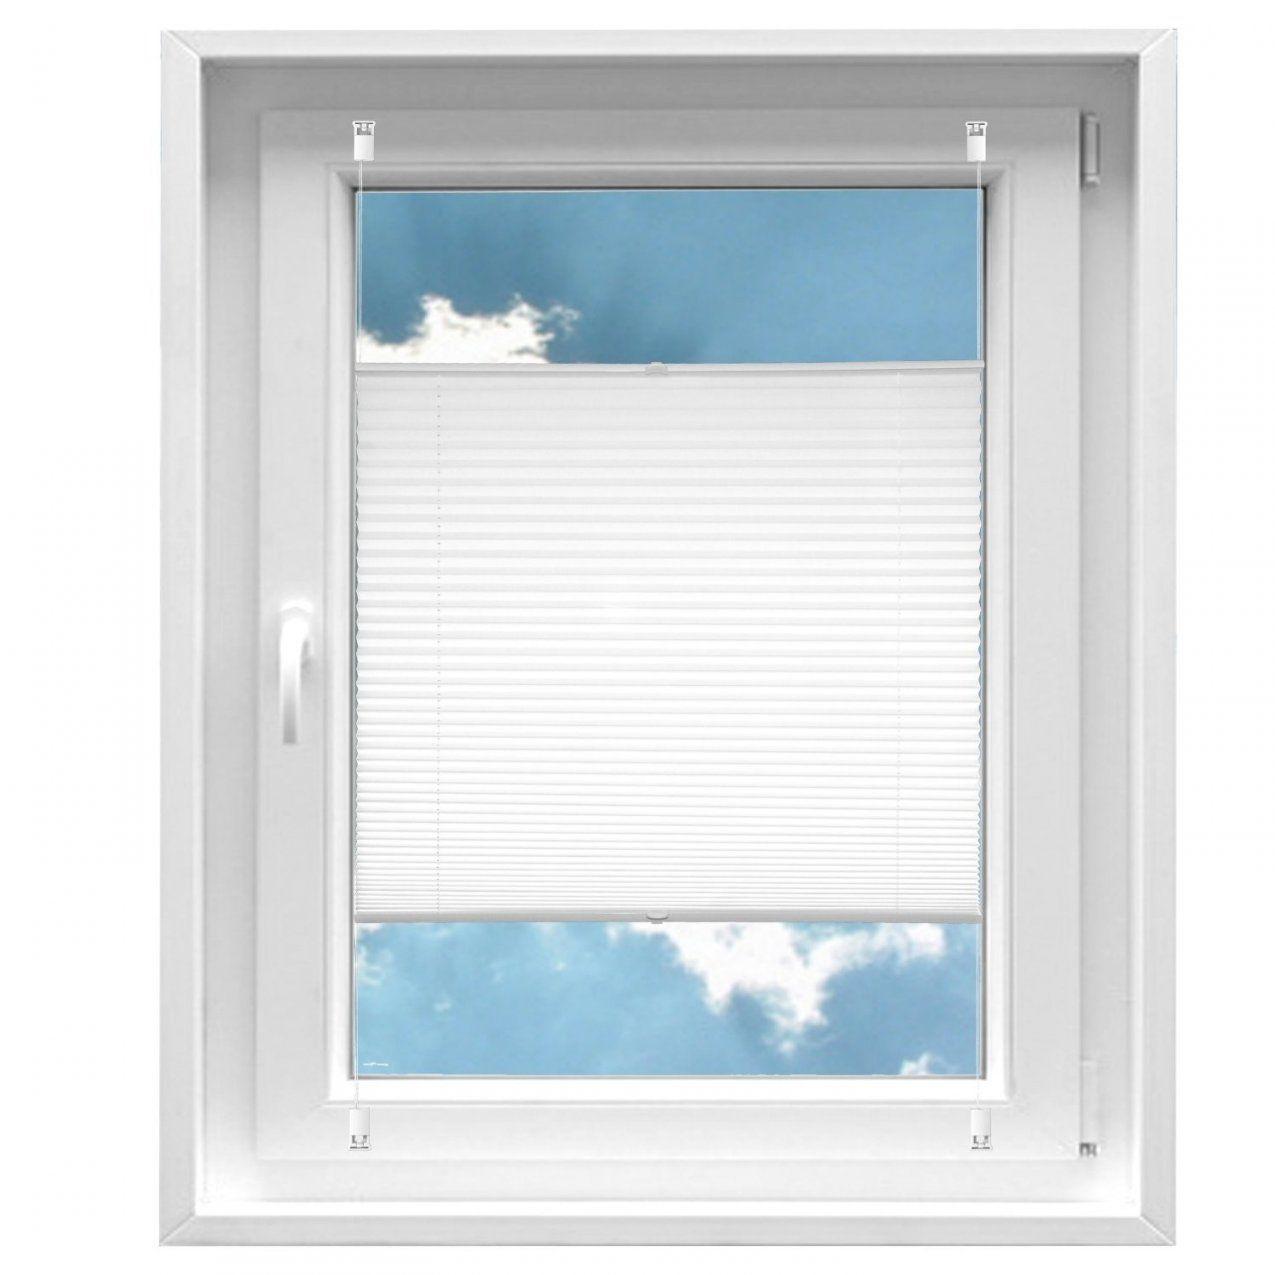 Fenster Jalousien Innen Ohne Bohren 195889 Klemm Jalousien Fenster von Fenster Rollos Für Innen Ohne Bohren Photo